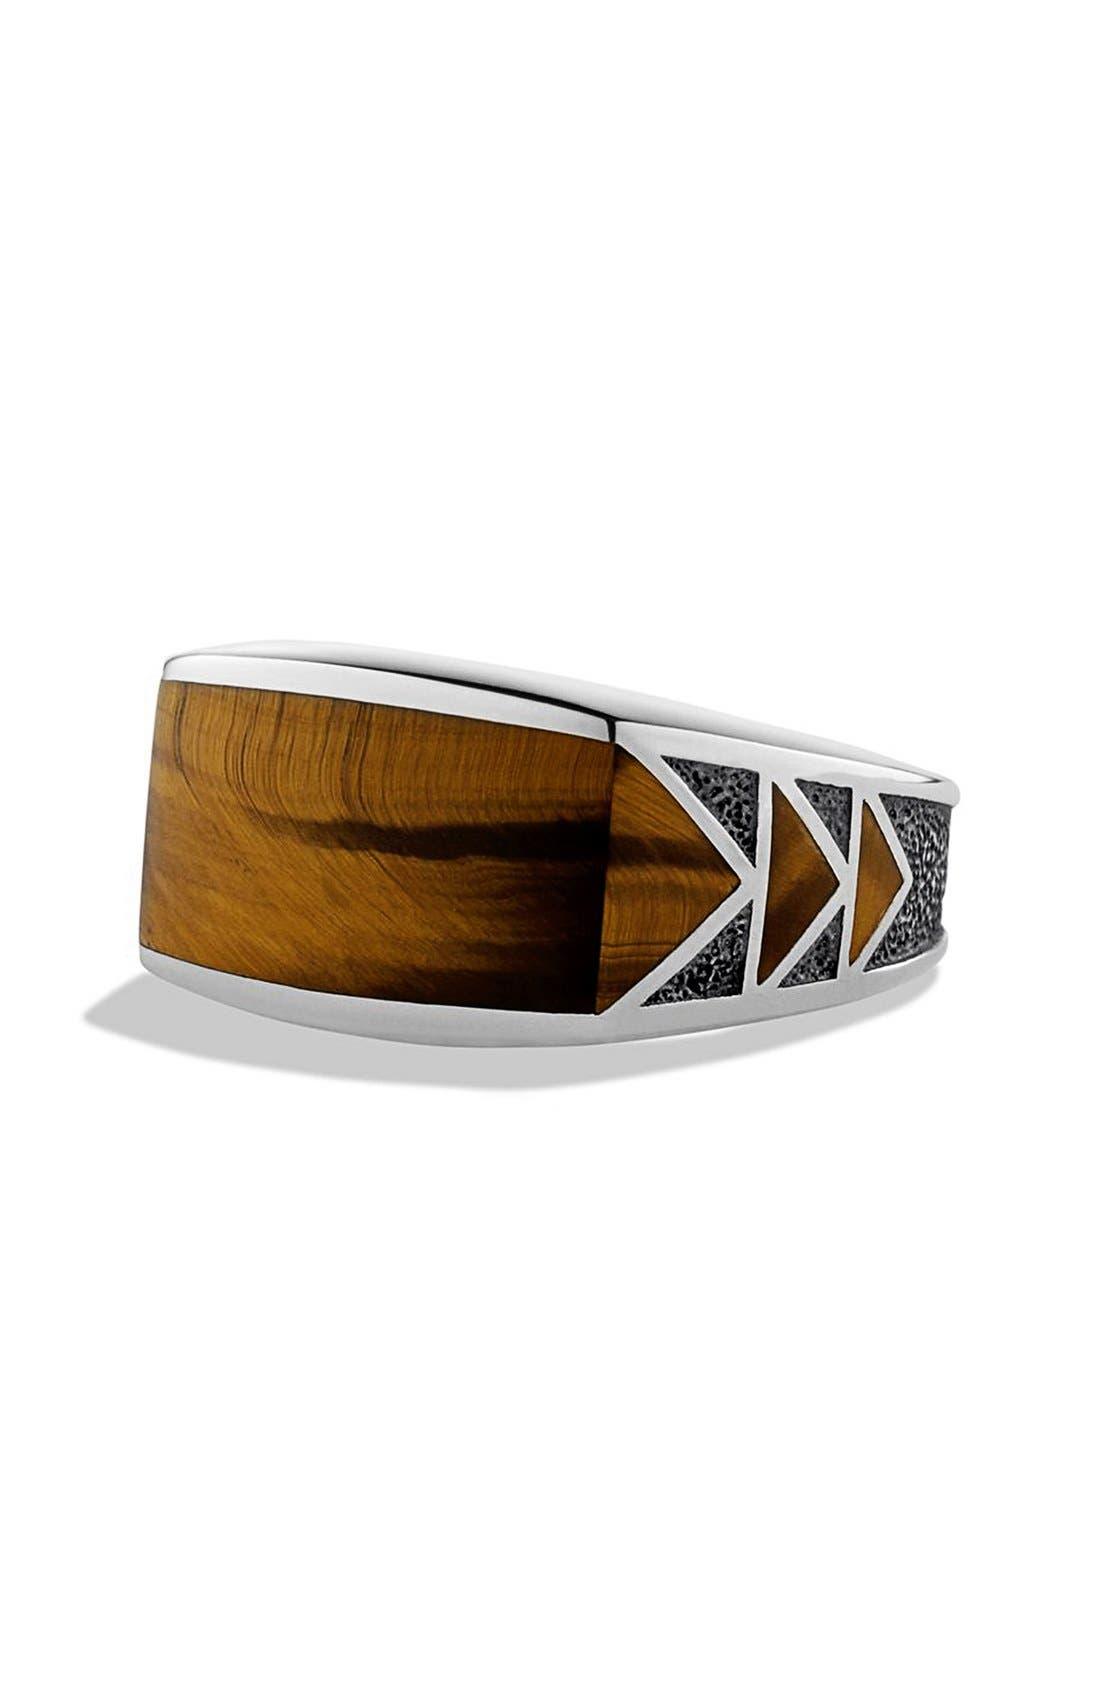 Main Image - David Yurman 'Frontier' Ring with Tiger's Eye